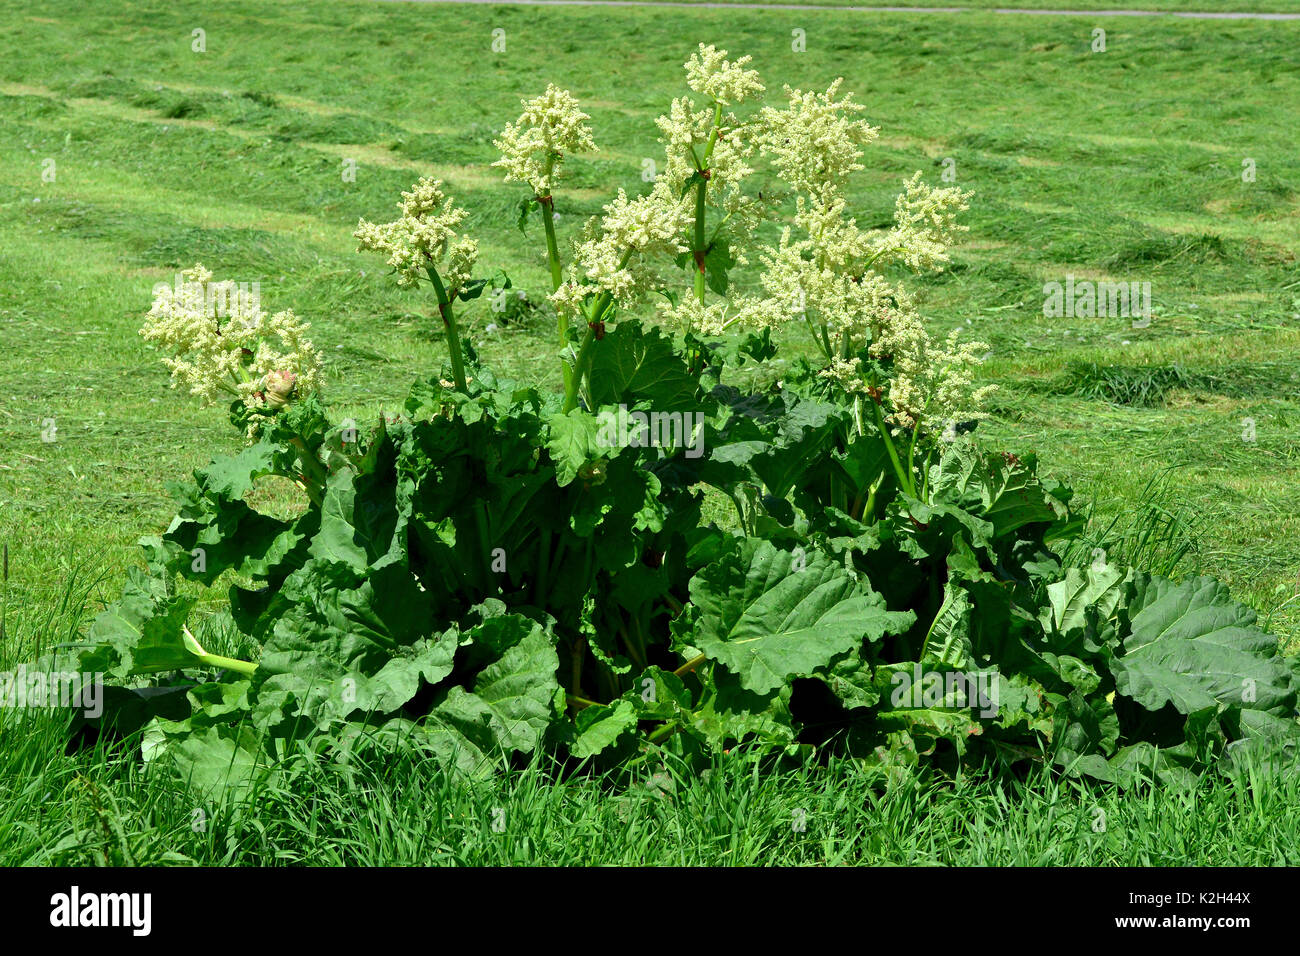 Garden Rhubarb (Rheum rhabarbarum), flowering. - Stock Image